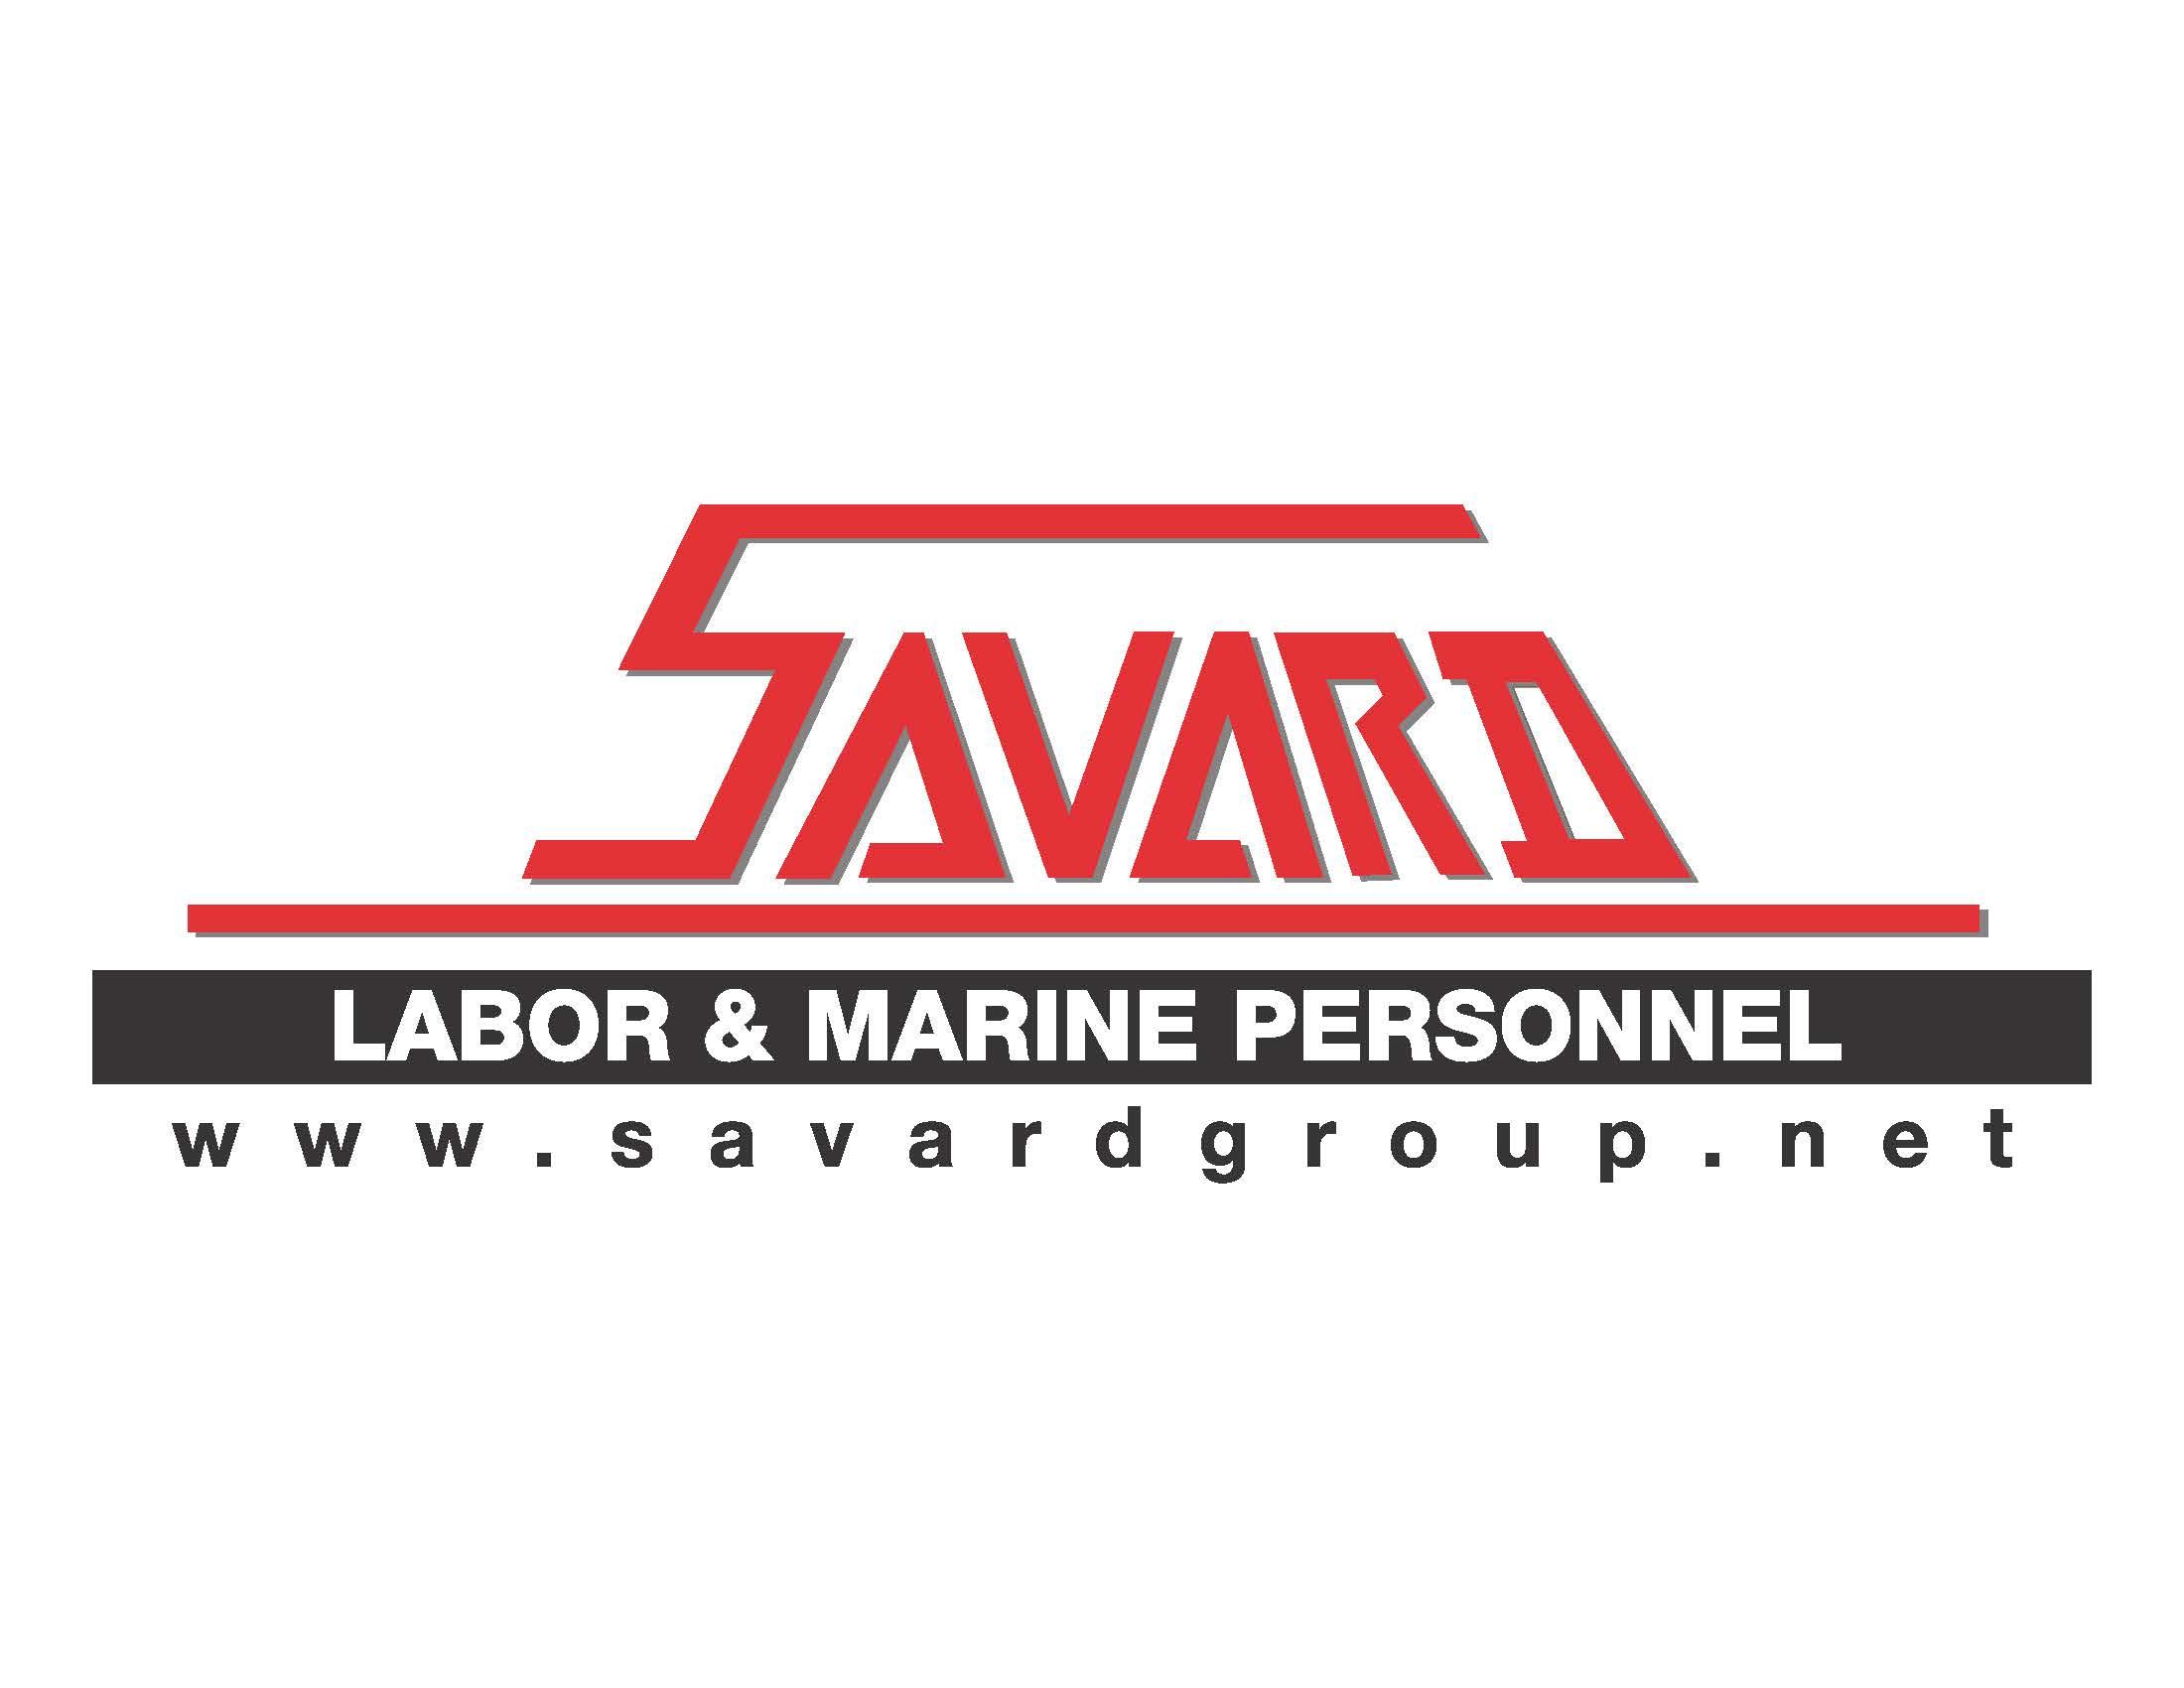 hydroblaster jobs now hiring ziprecruiter savard is hiring hydroblasters in houston tx job 4685